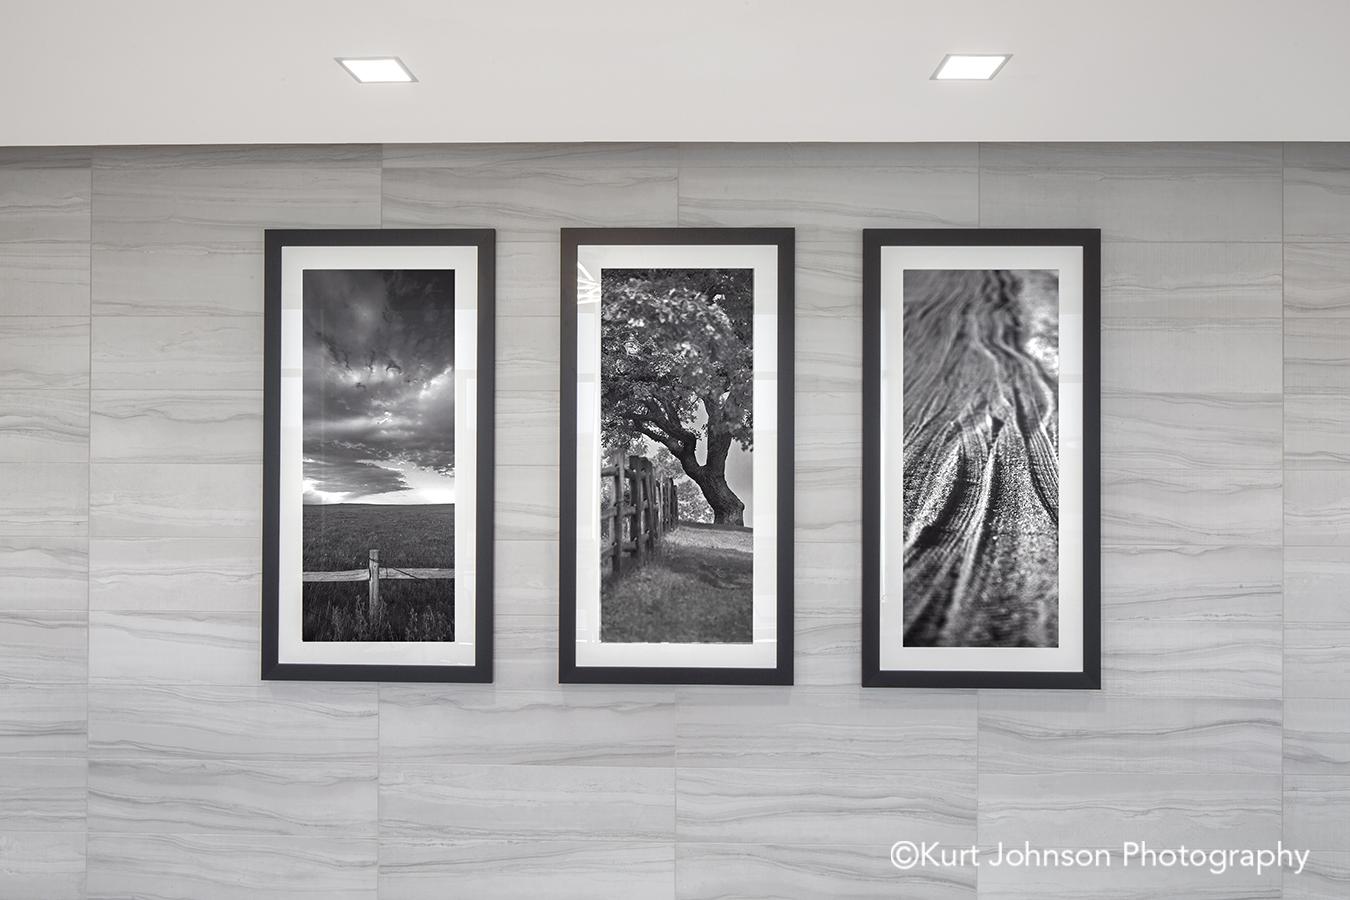 black frame white matte framed art install landscape tree fence road texture hallway corridor installation faith regional health norfolk ne